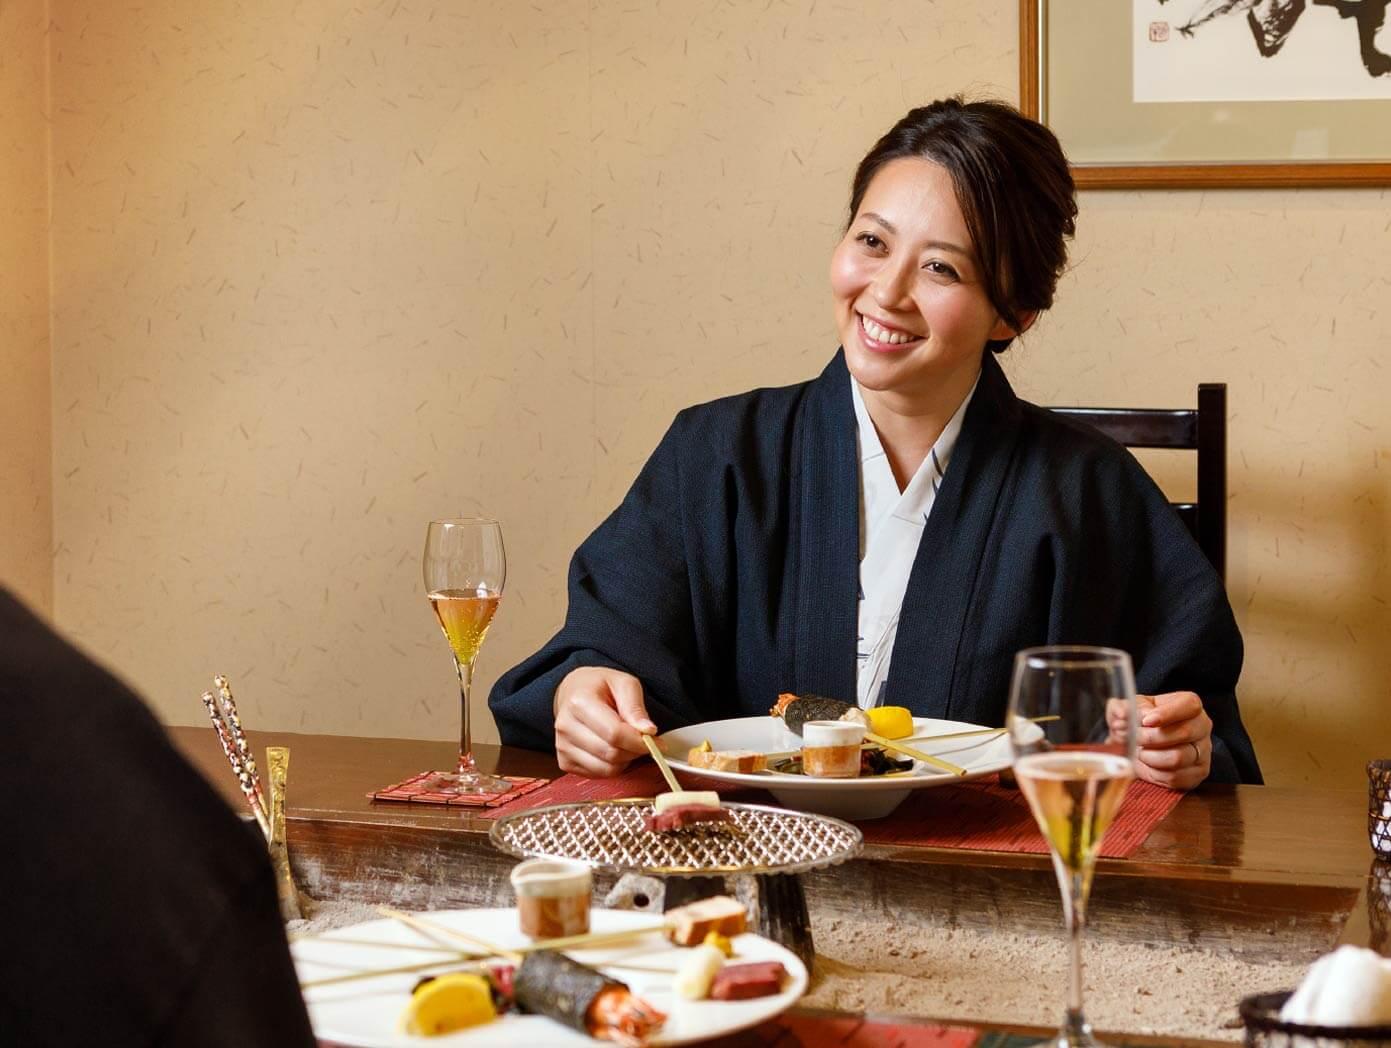 写真:食事中の女性